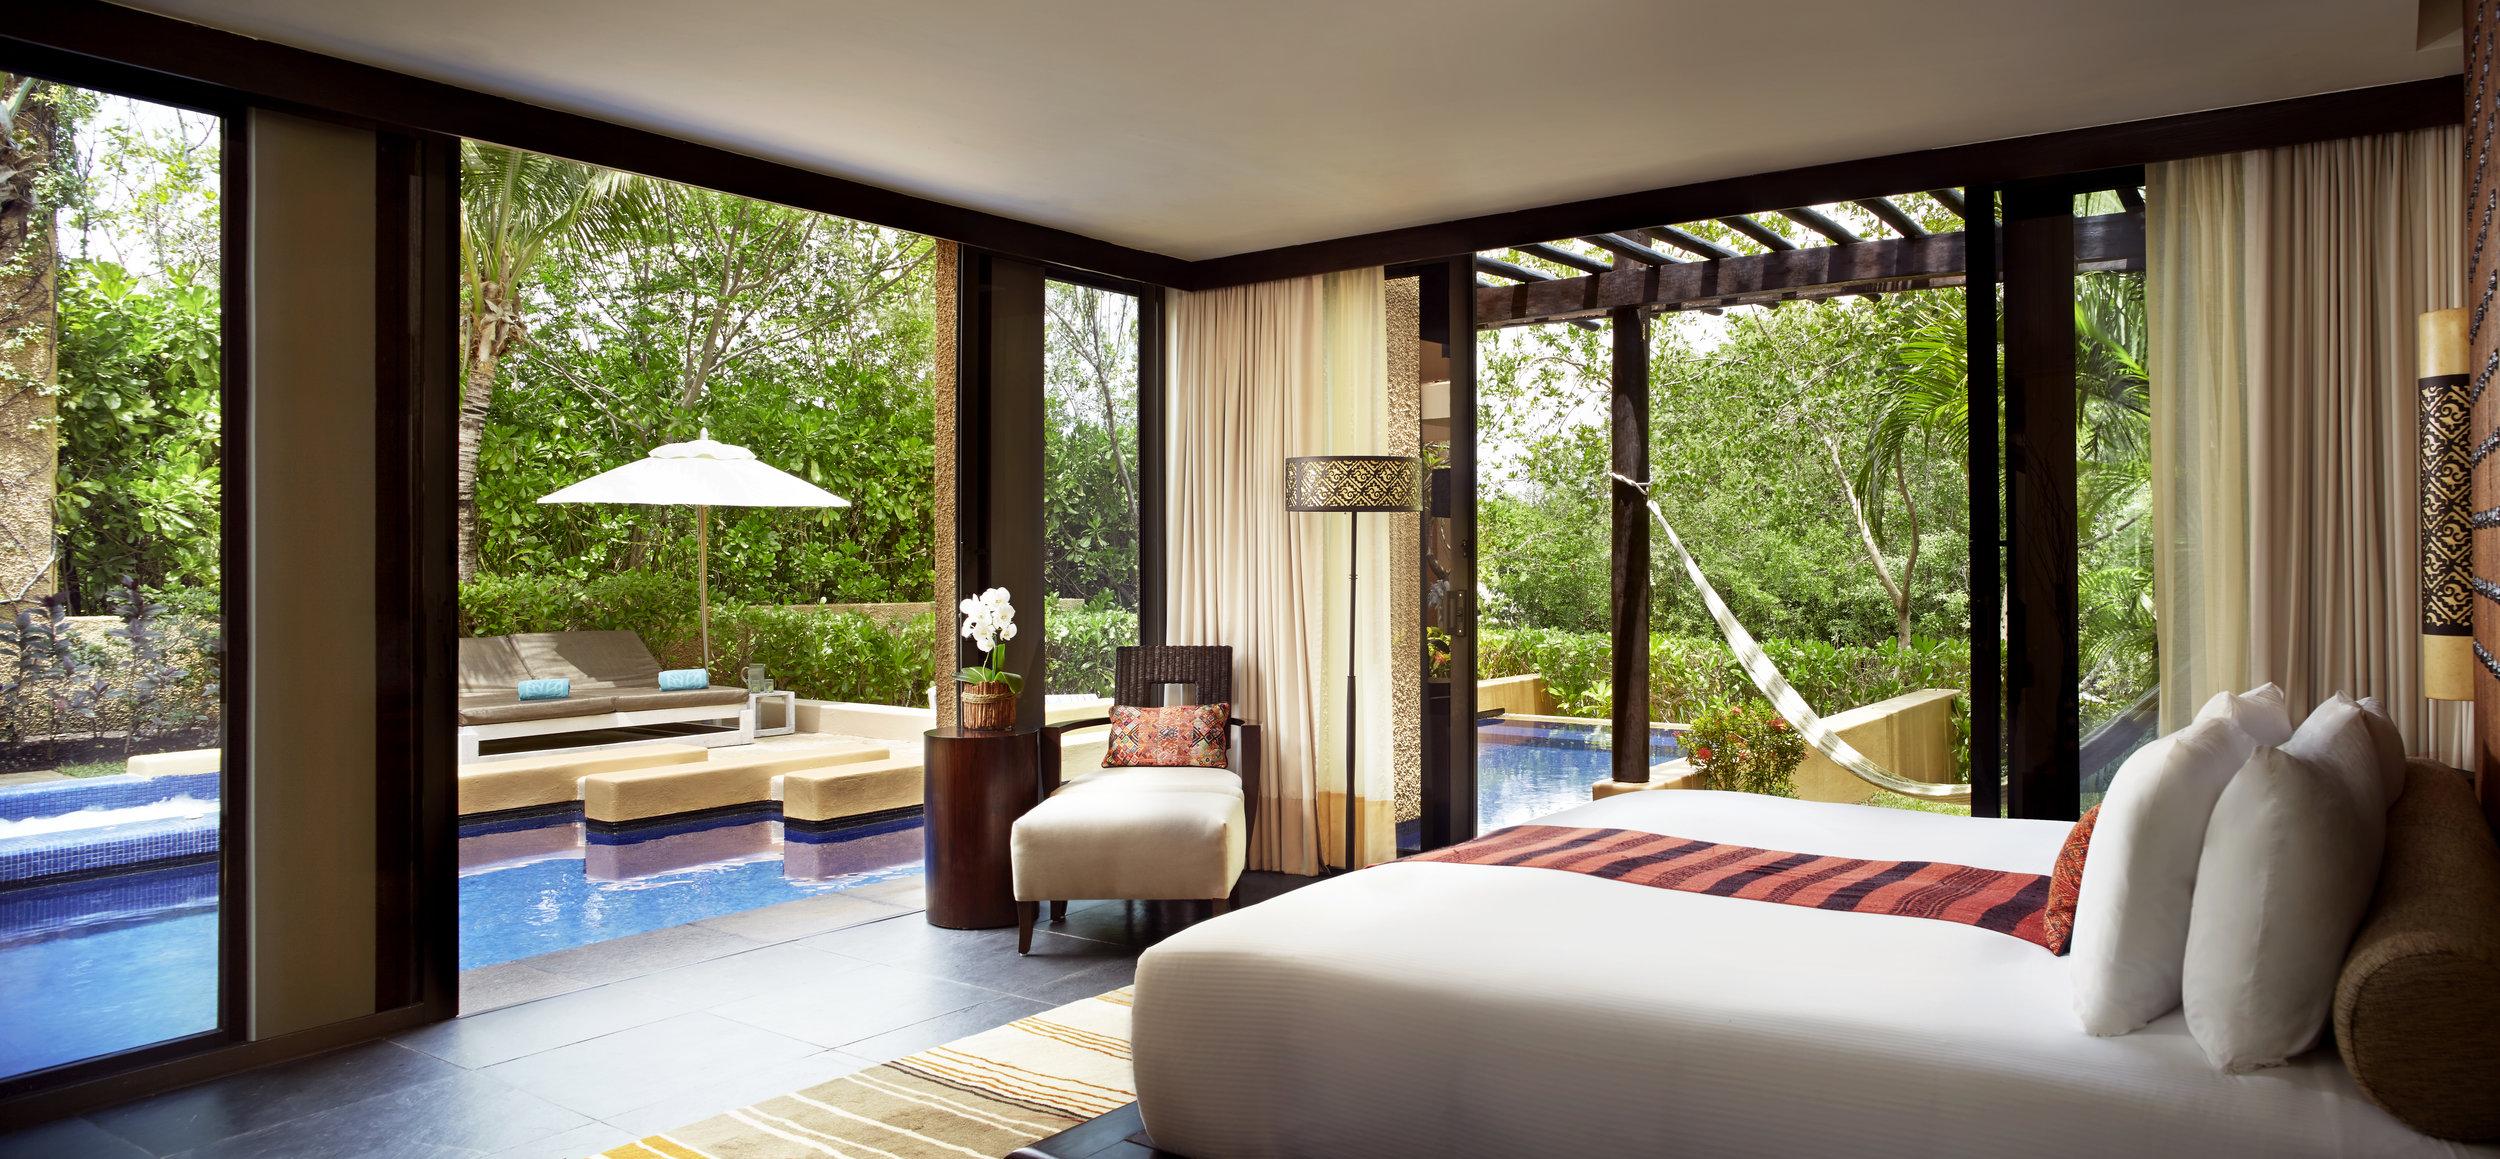 BTMK - Spa Pool Villa - bedroom (High Res).jpg